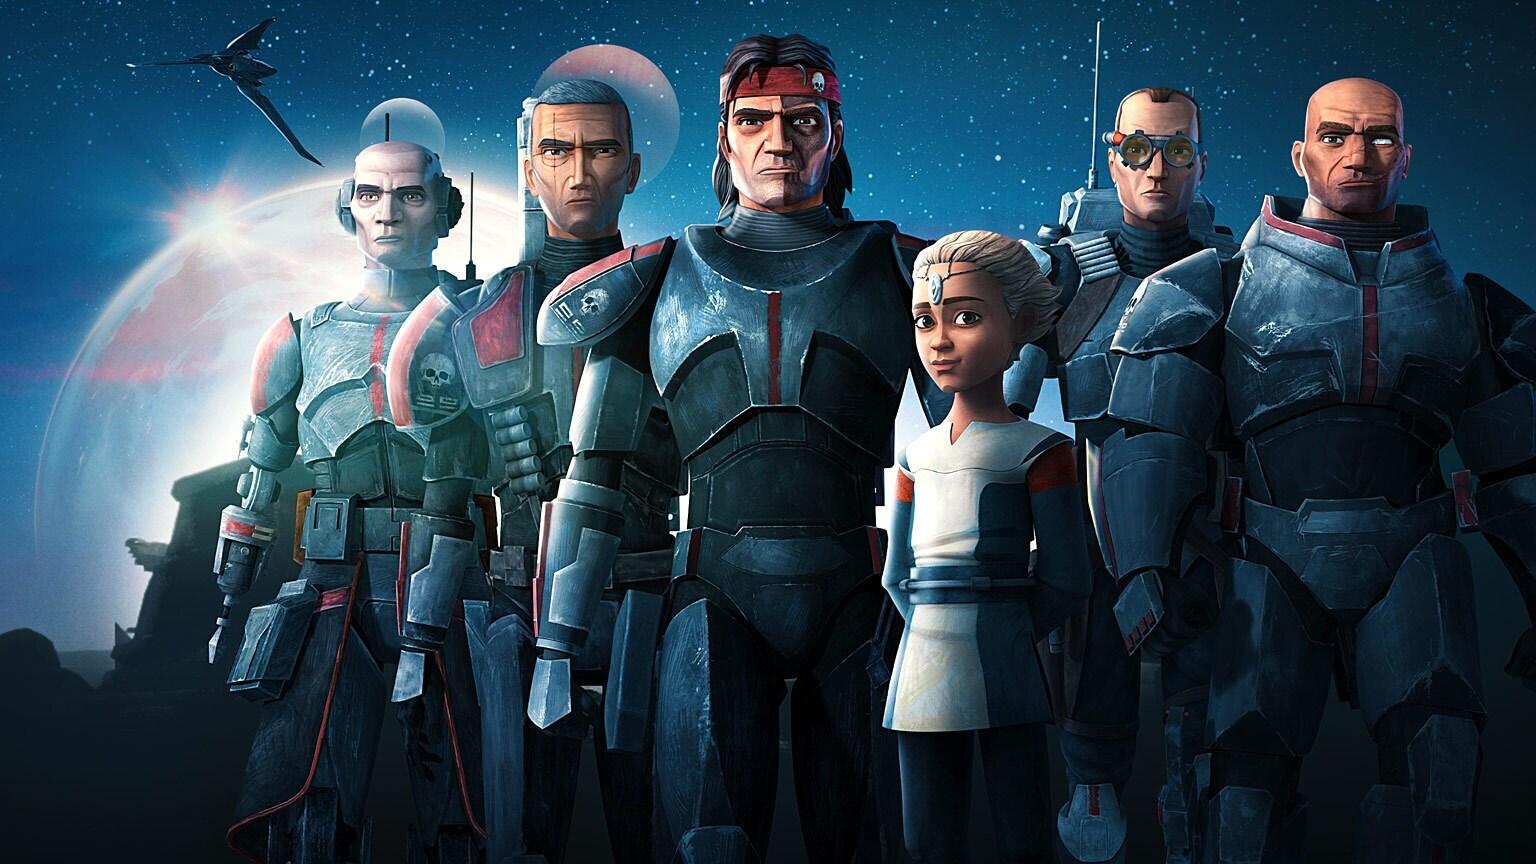 Disney+ Announces Season 2 of Star Wars: The Bad Batch